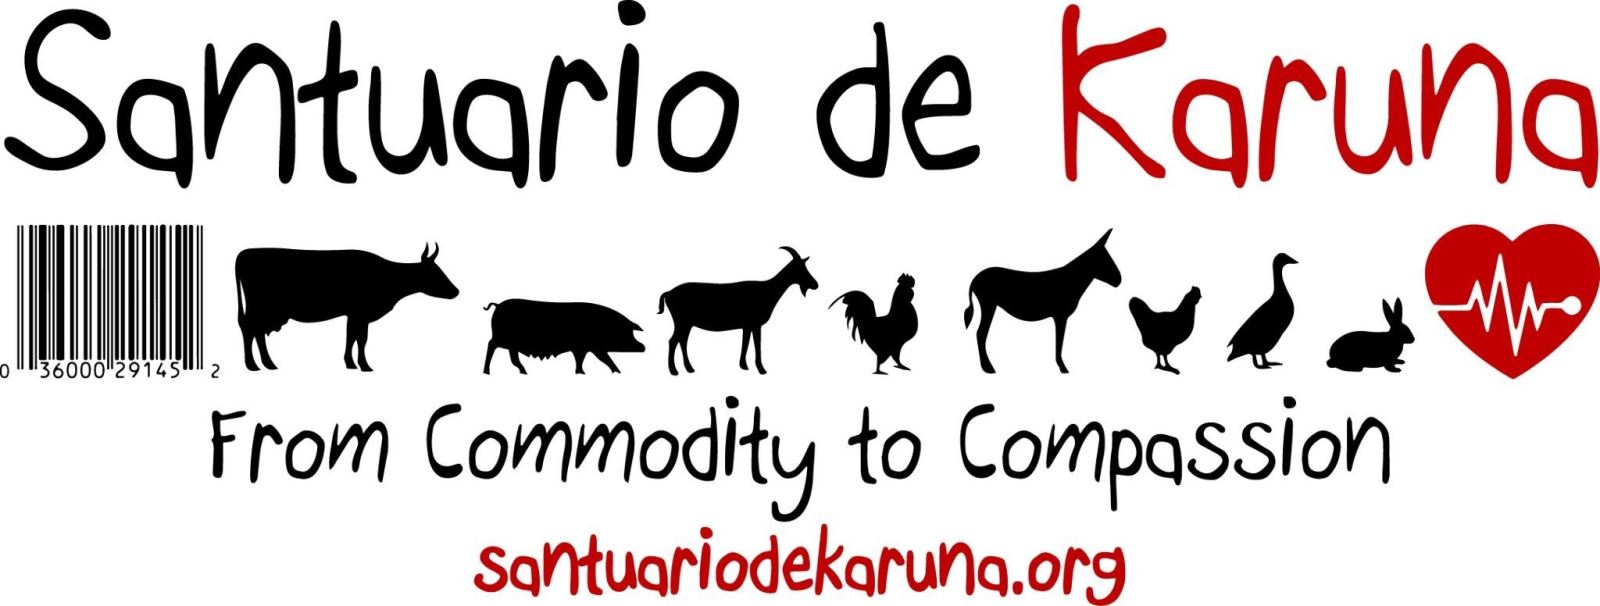 Santuario de Karuna From Commodity to Compassion